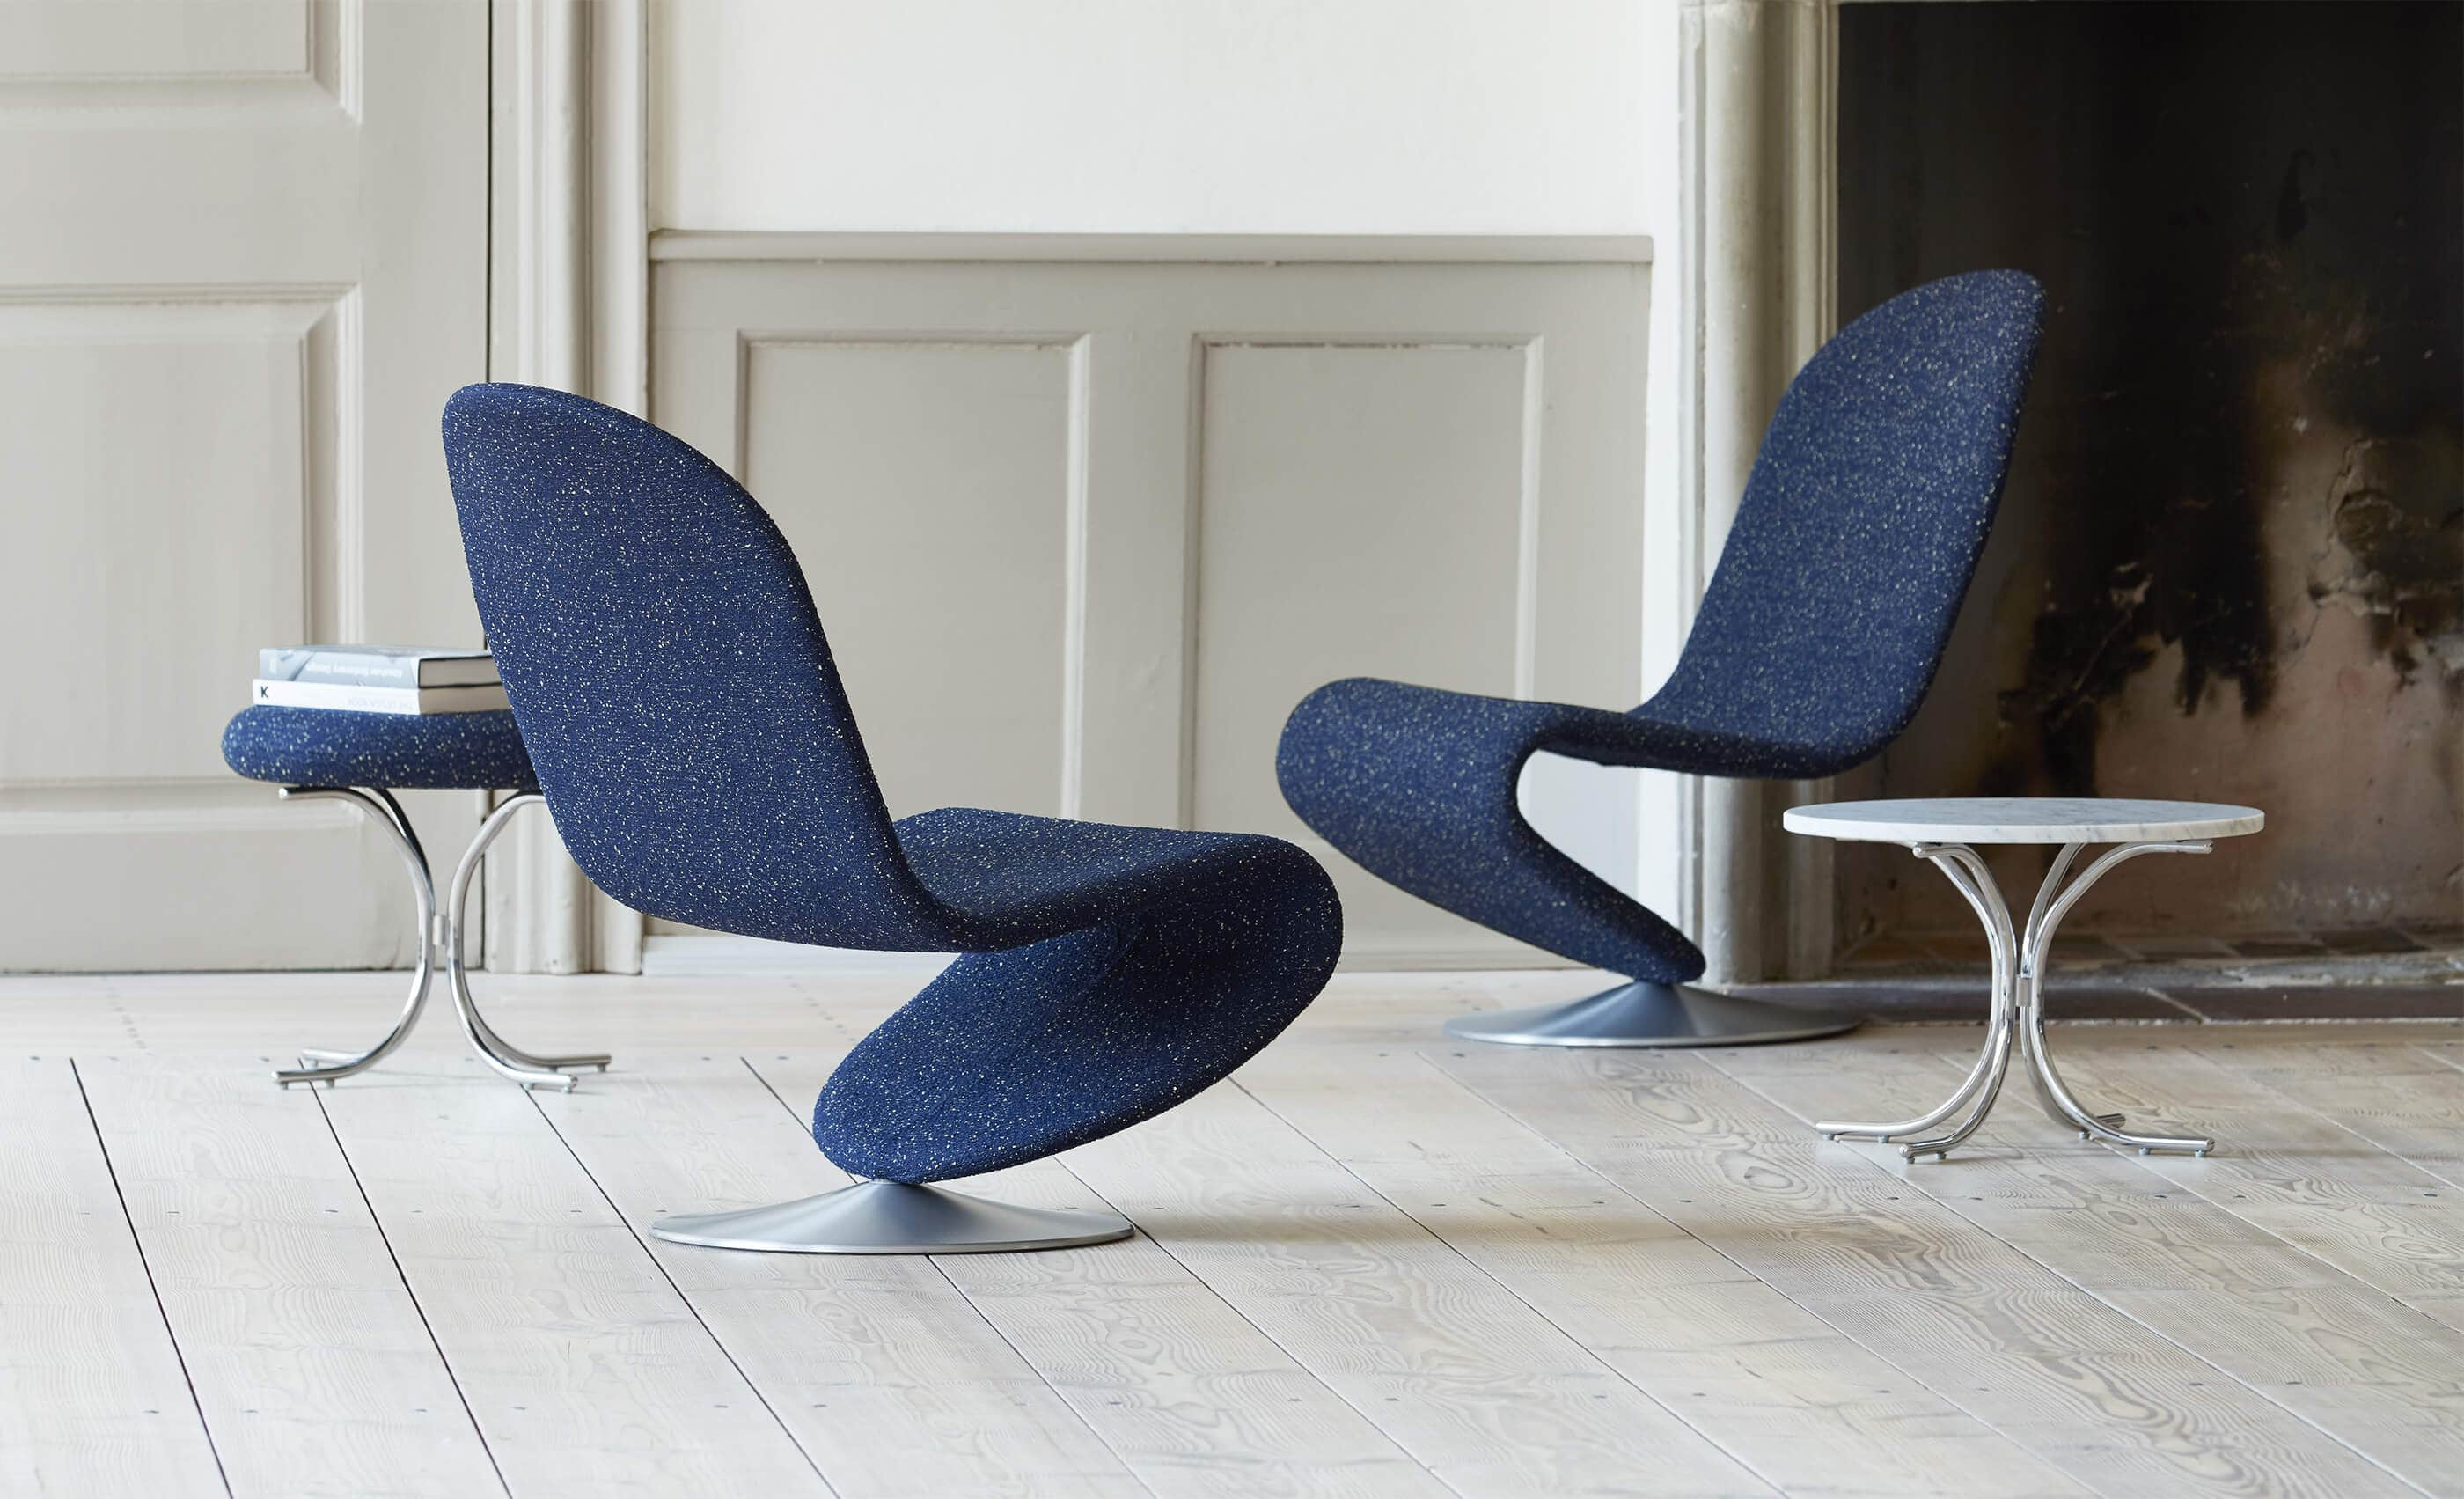 verpan designermøbler